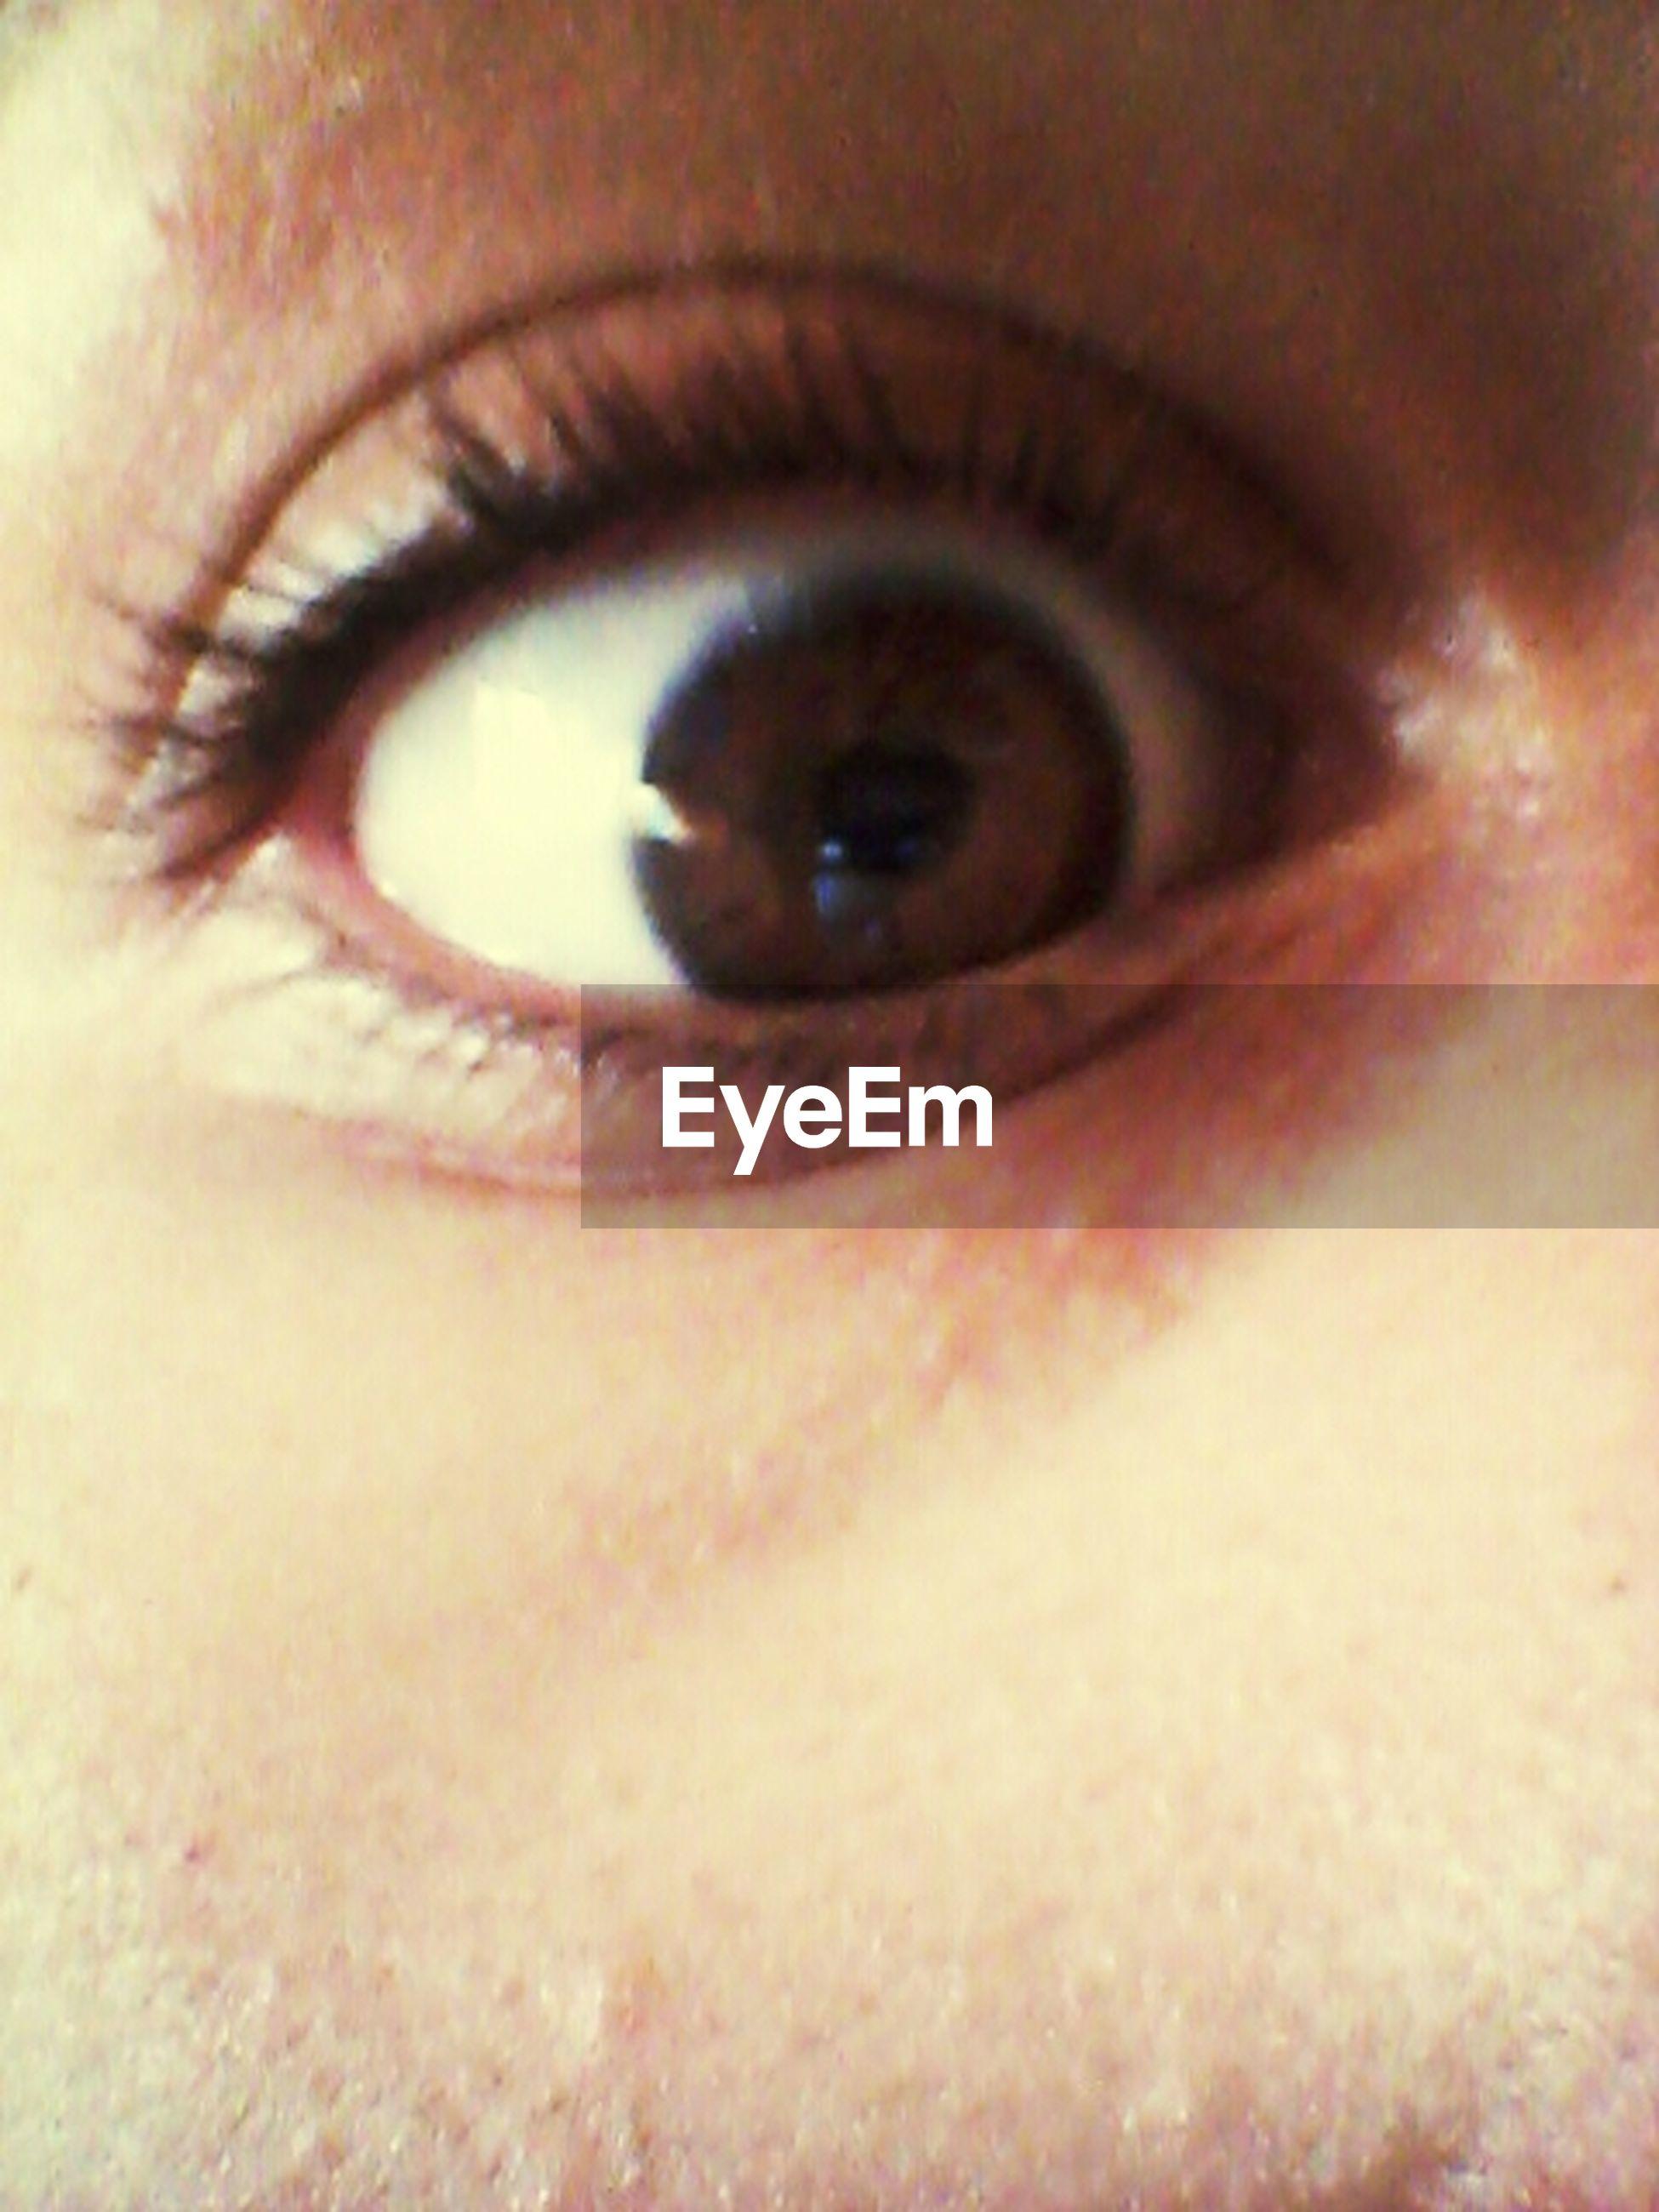 human eye, eyelash, close-up, looking at camera, portrait, eyesight, lifestyles, sensory perception, human face, human skin, part of, indoors, iris - eye, extreme close-up, headshot, eyeball, young adult